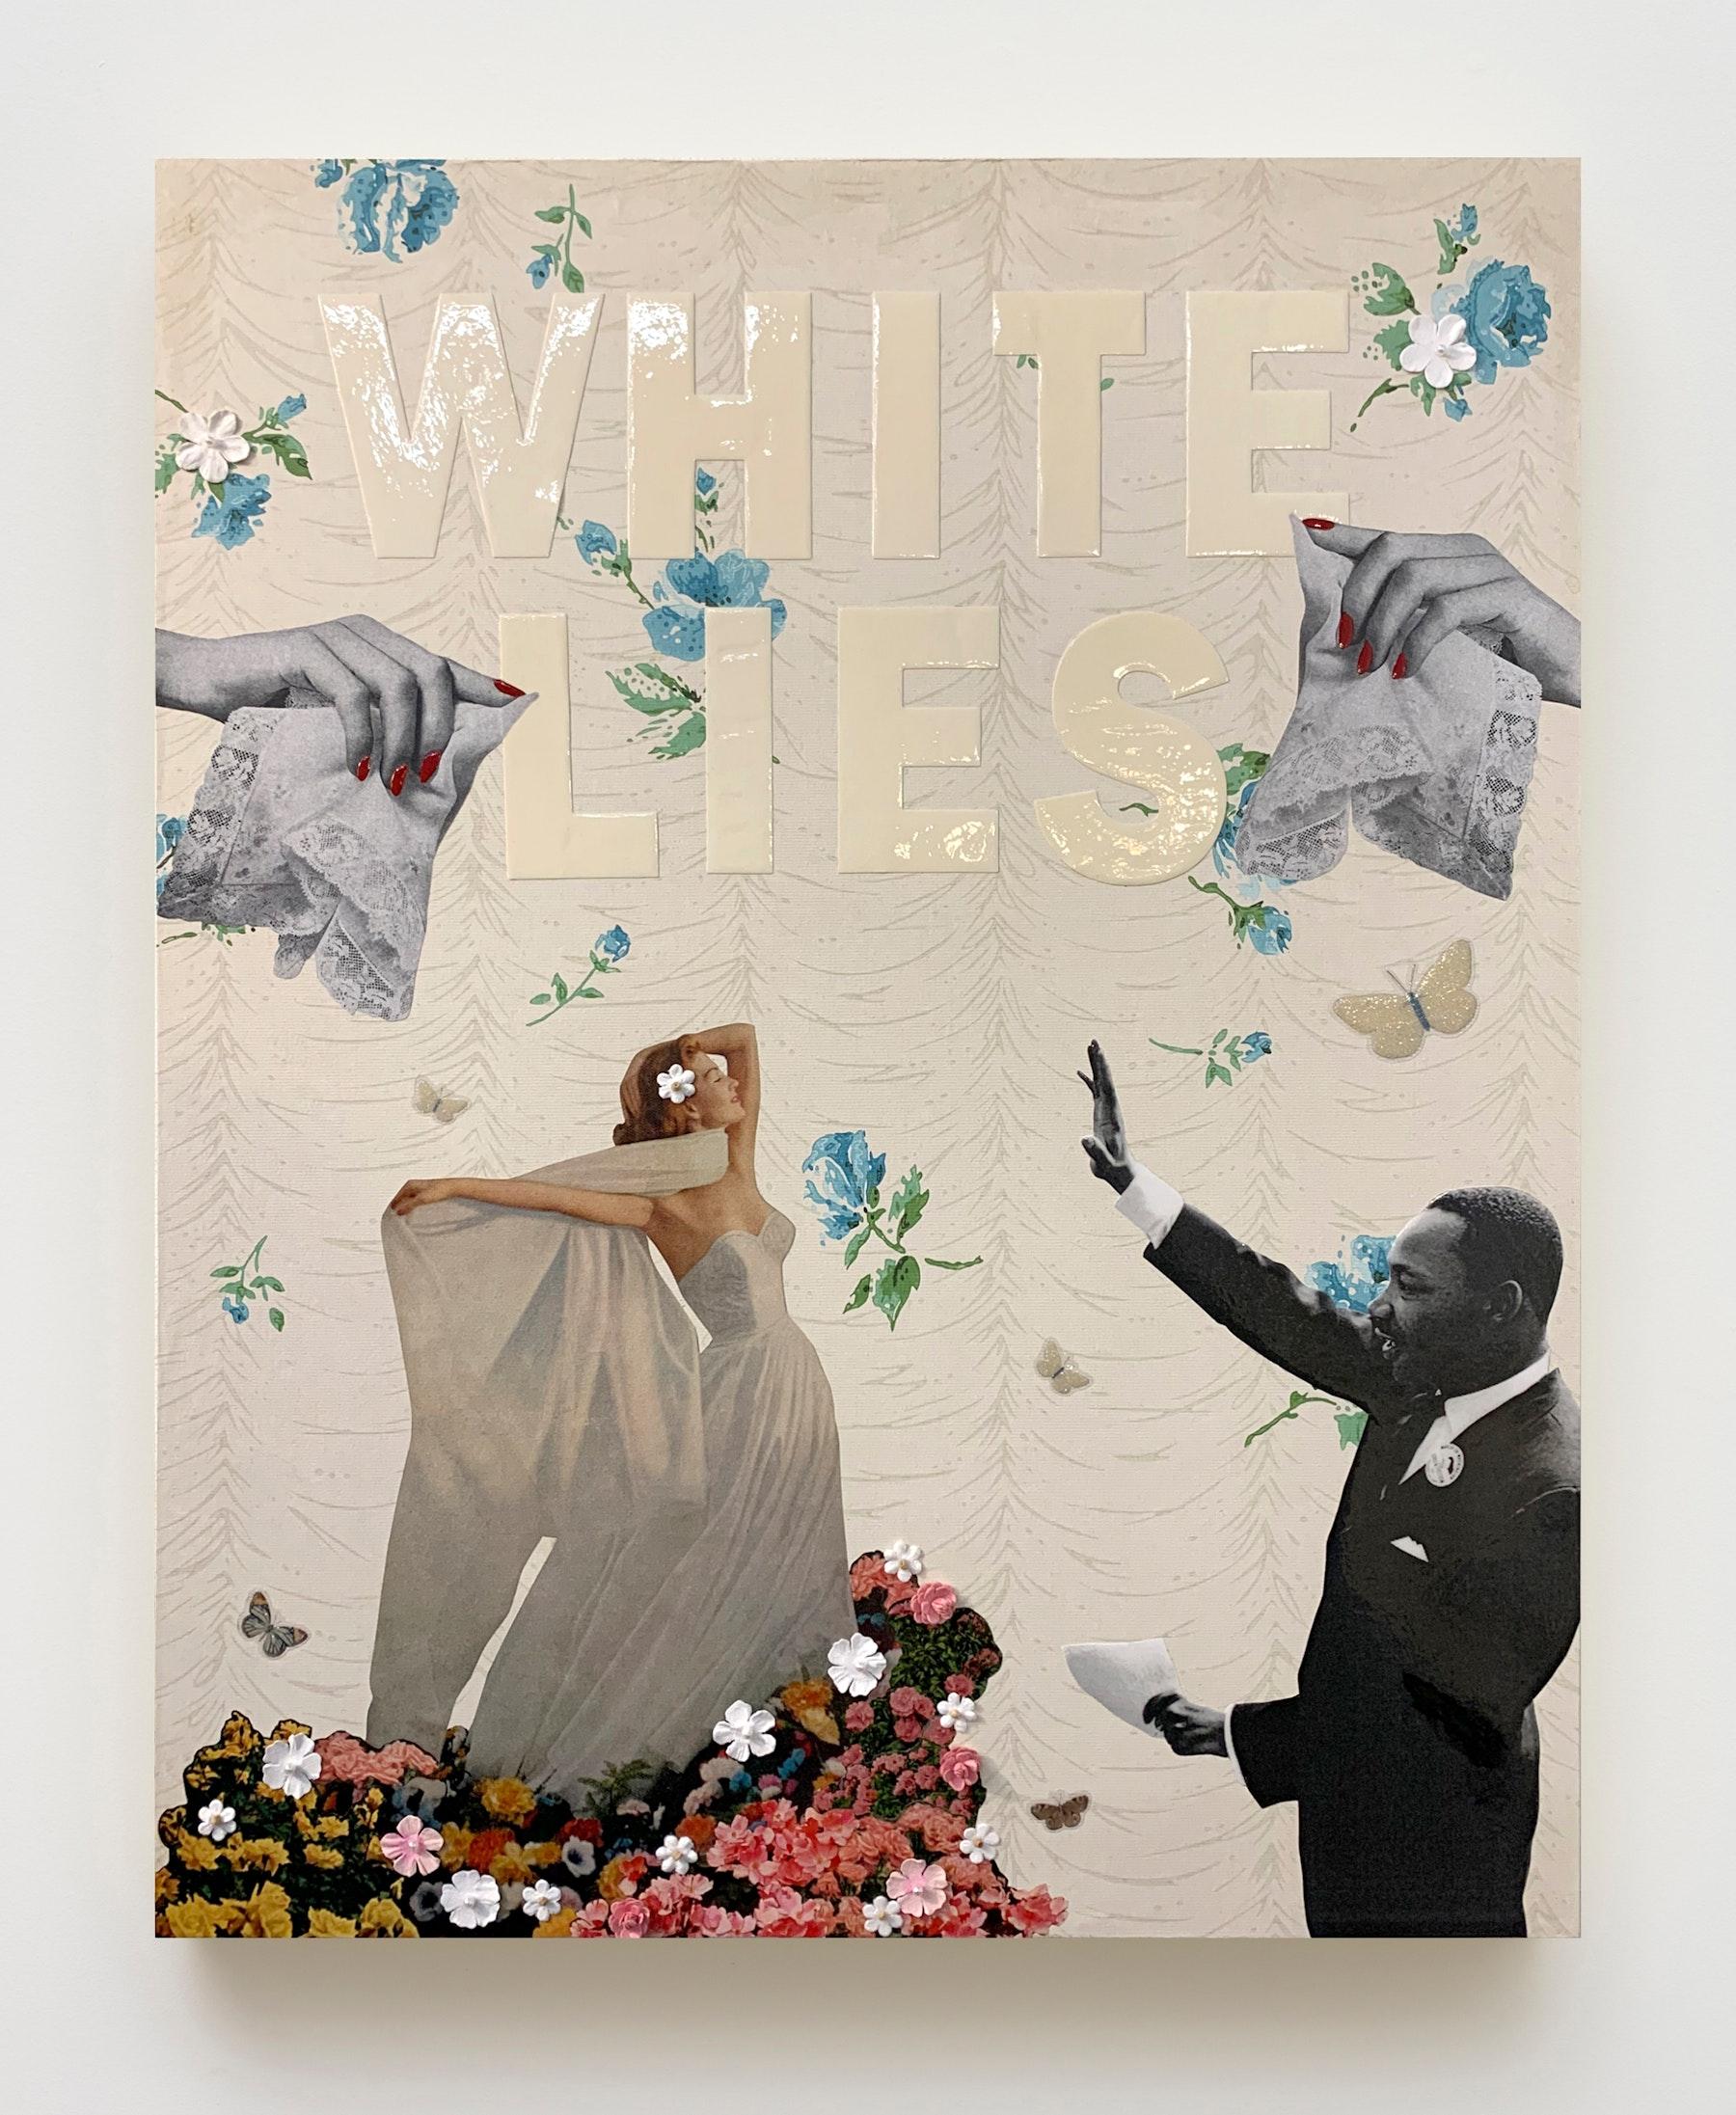 "Genevieve Gaignard ""White Lies,"" 2020 Mixed media on panel 20 x 16 x 1.5"" [HxWxD] (50.8 x 40.64 x 3.81 cm) Inventory #GEN318 Courtesy of the artist and Vielmetter Los Angeles"